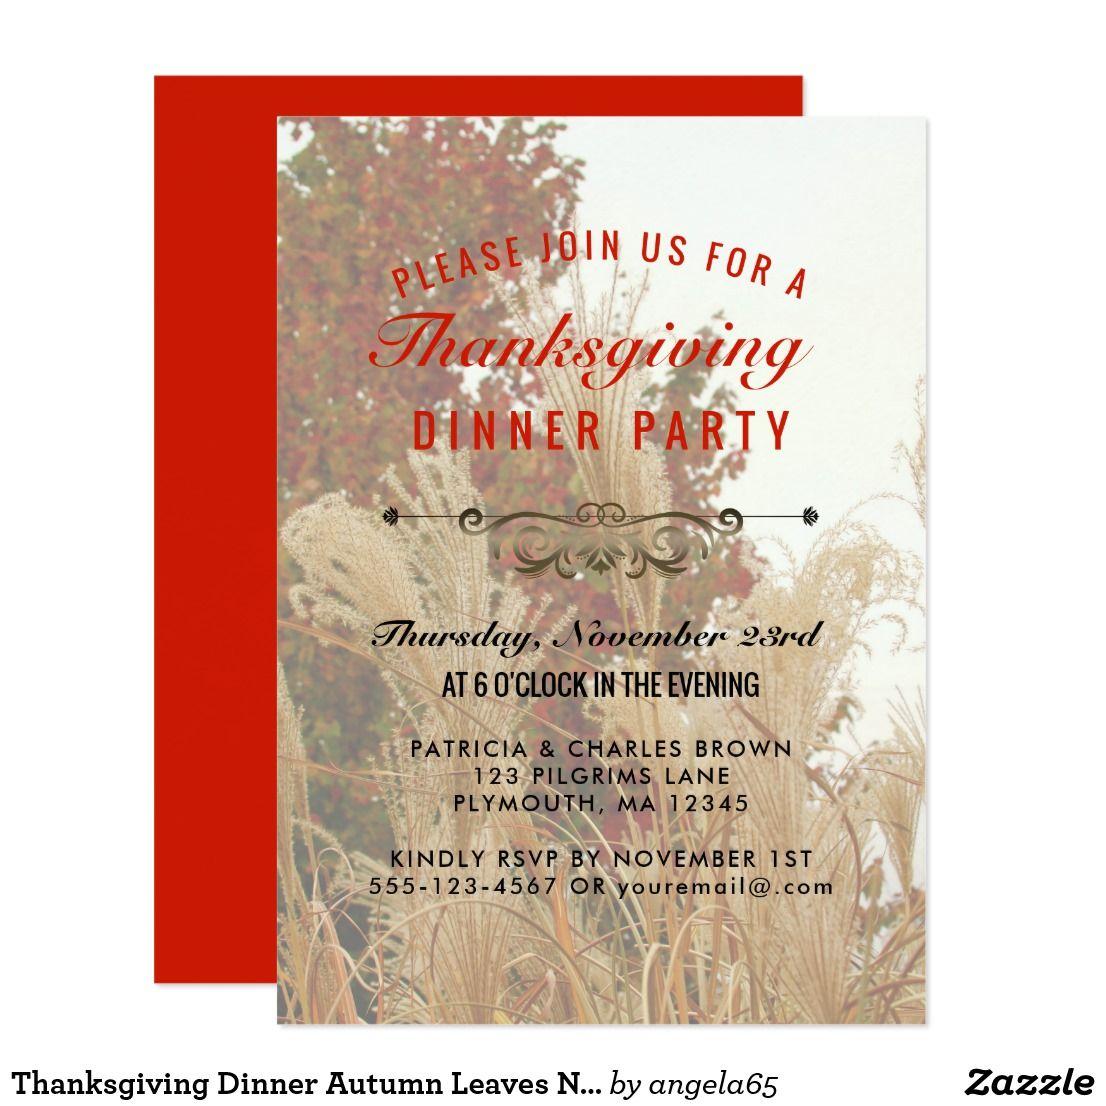 Thanksgiving Dinner Autumn Leaves Nature Red Invitation